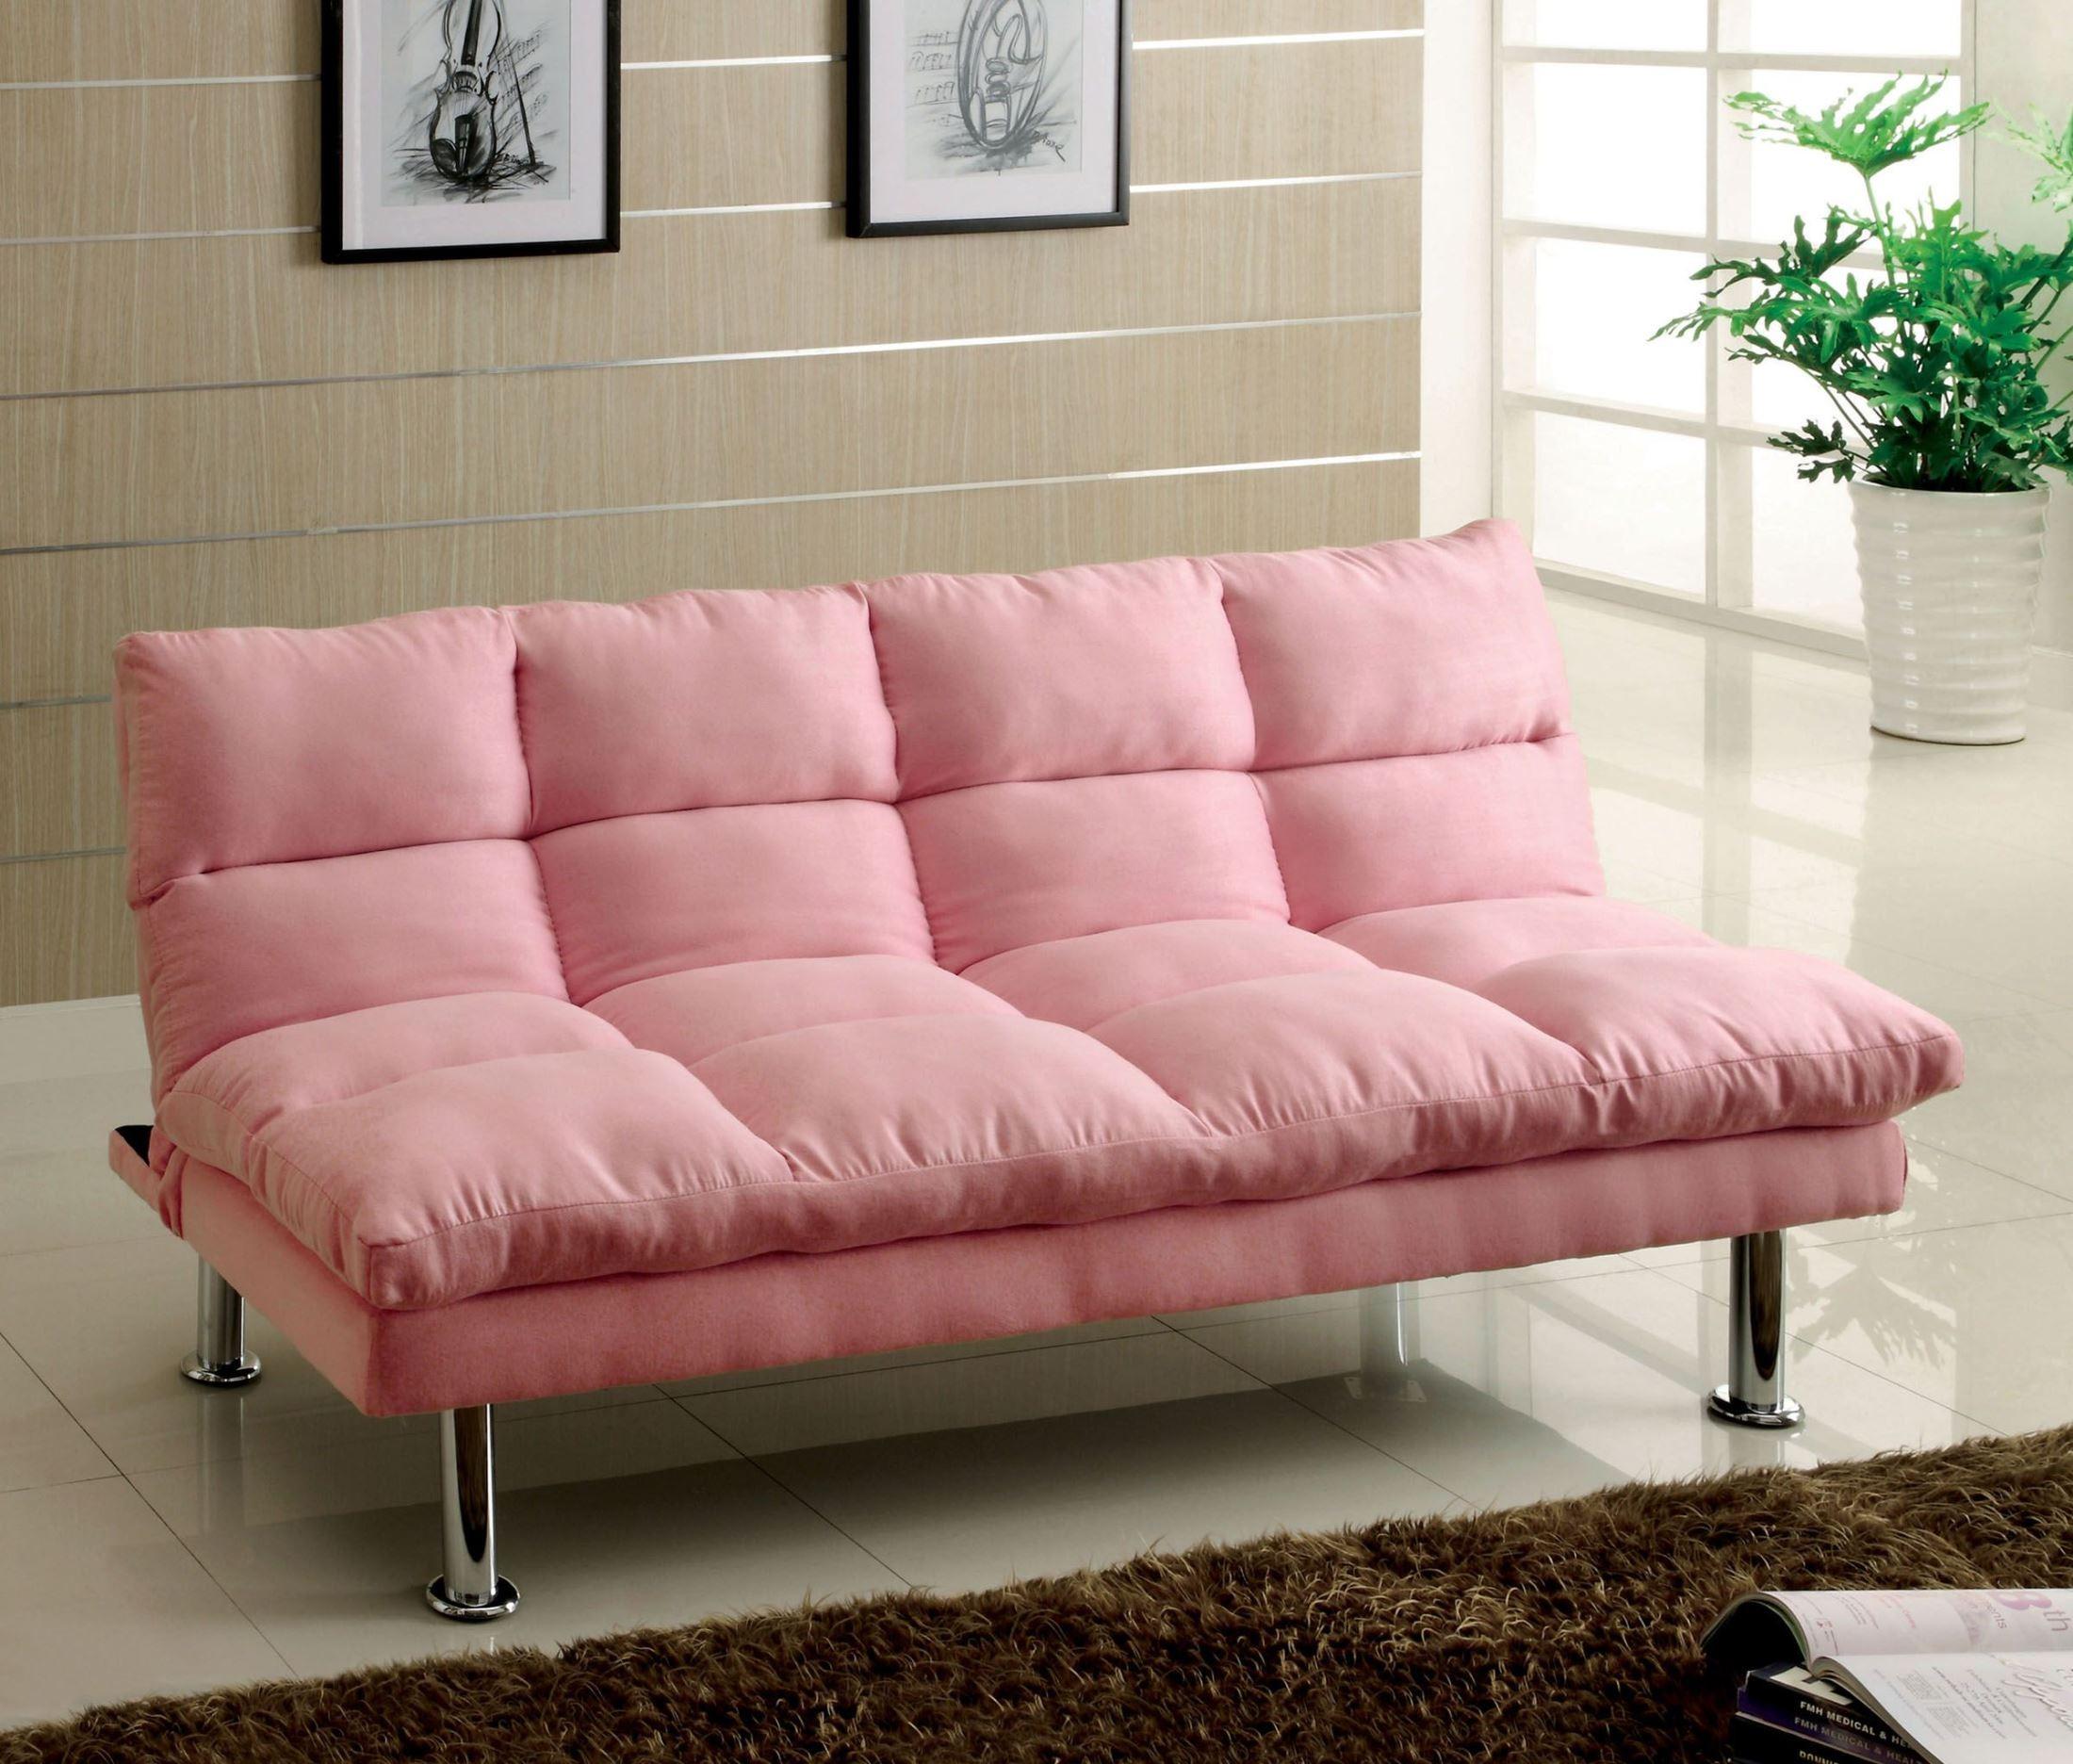 Saratoga Pink Microfiber Futon Sofa From Furniture Of